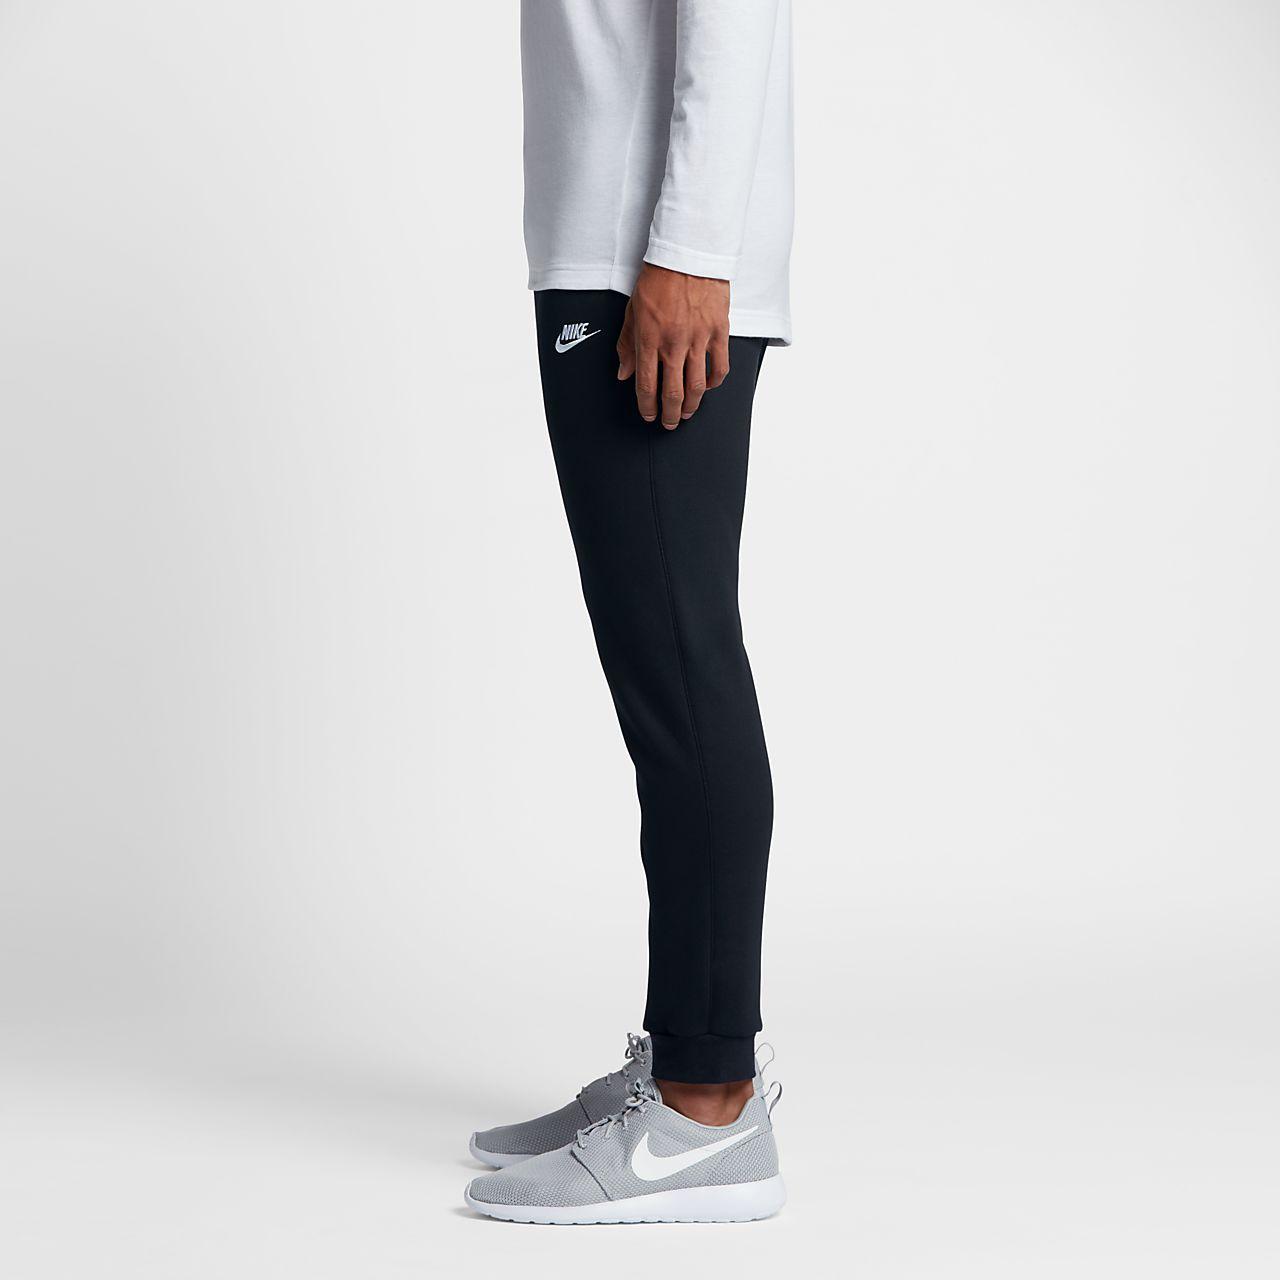 288729d38c2b Nike Sportswear Club Fleece Men s Joggers. Nike.com